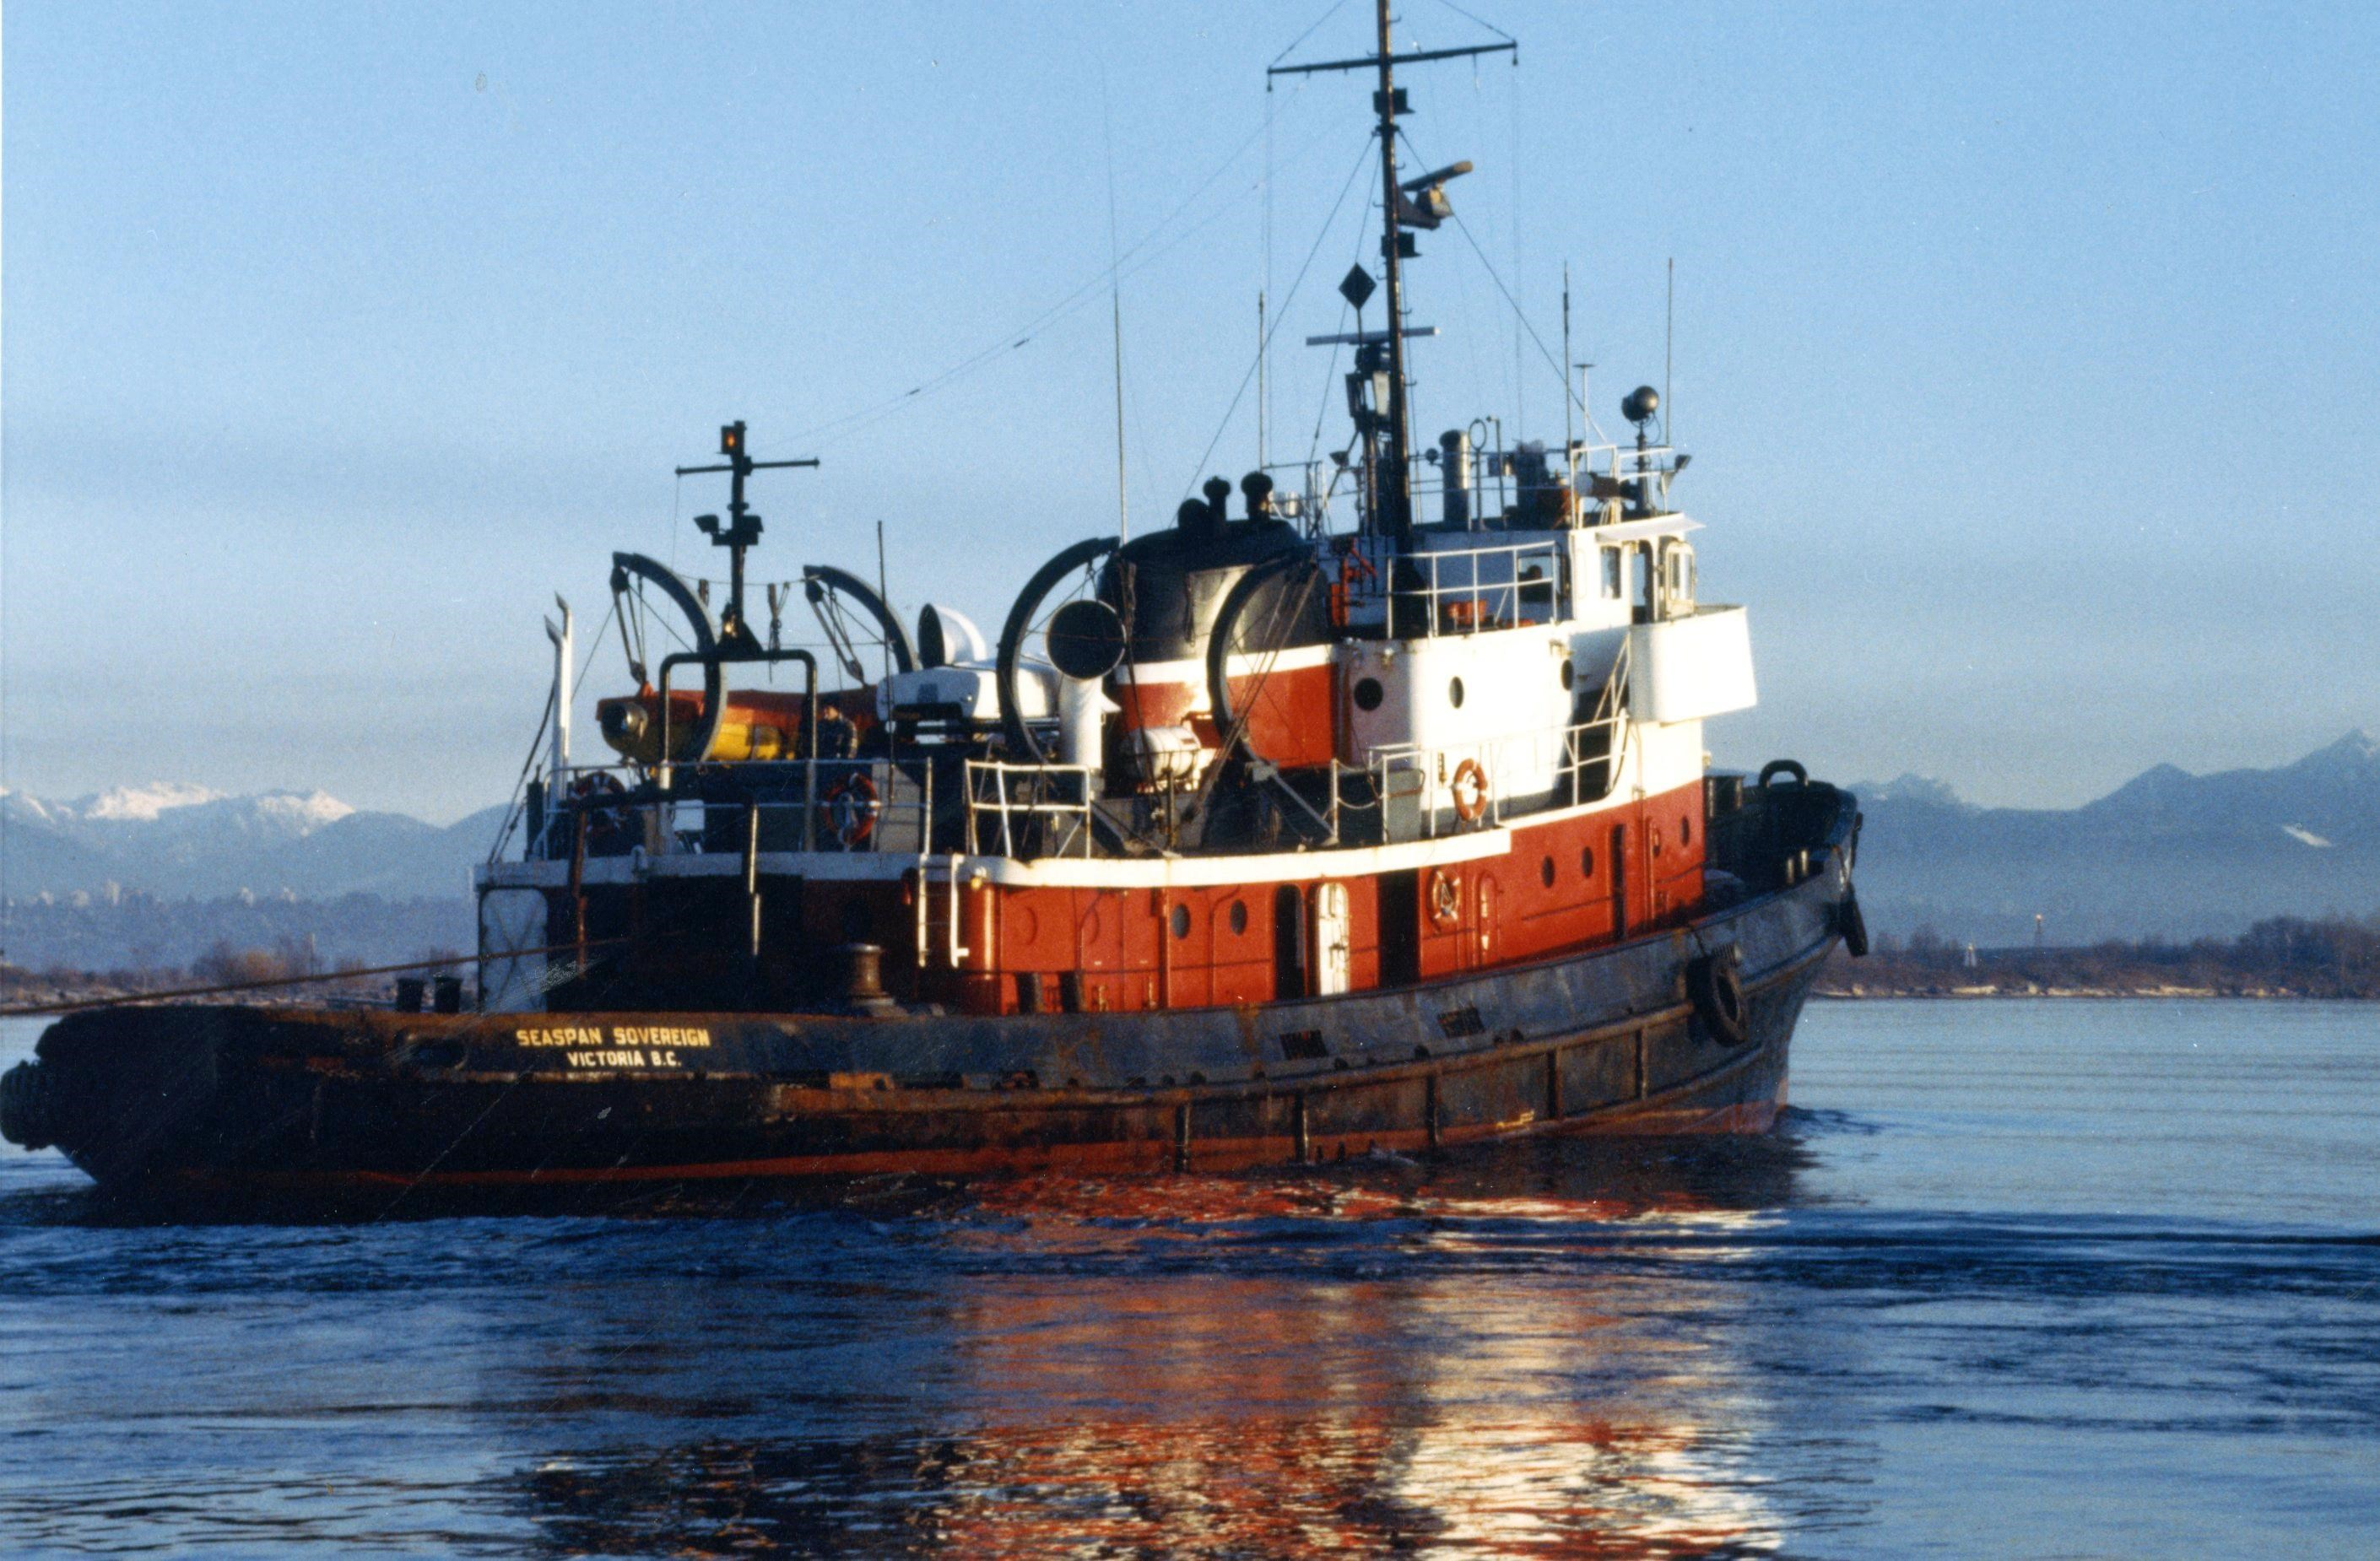 Calumet Shipyard Ocean Going Tug 1944 Used Boat for Sale ...